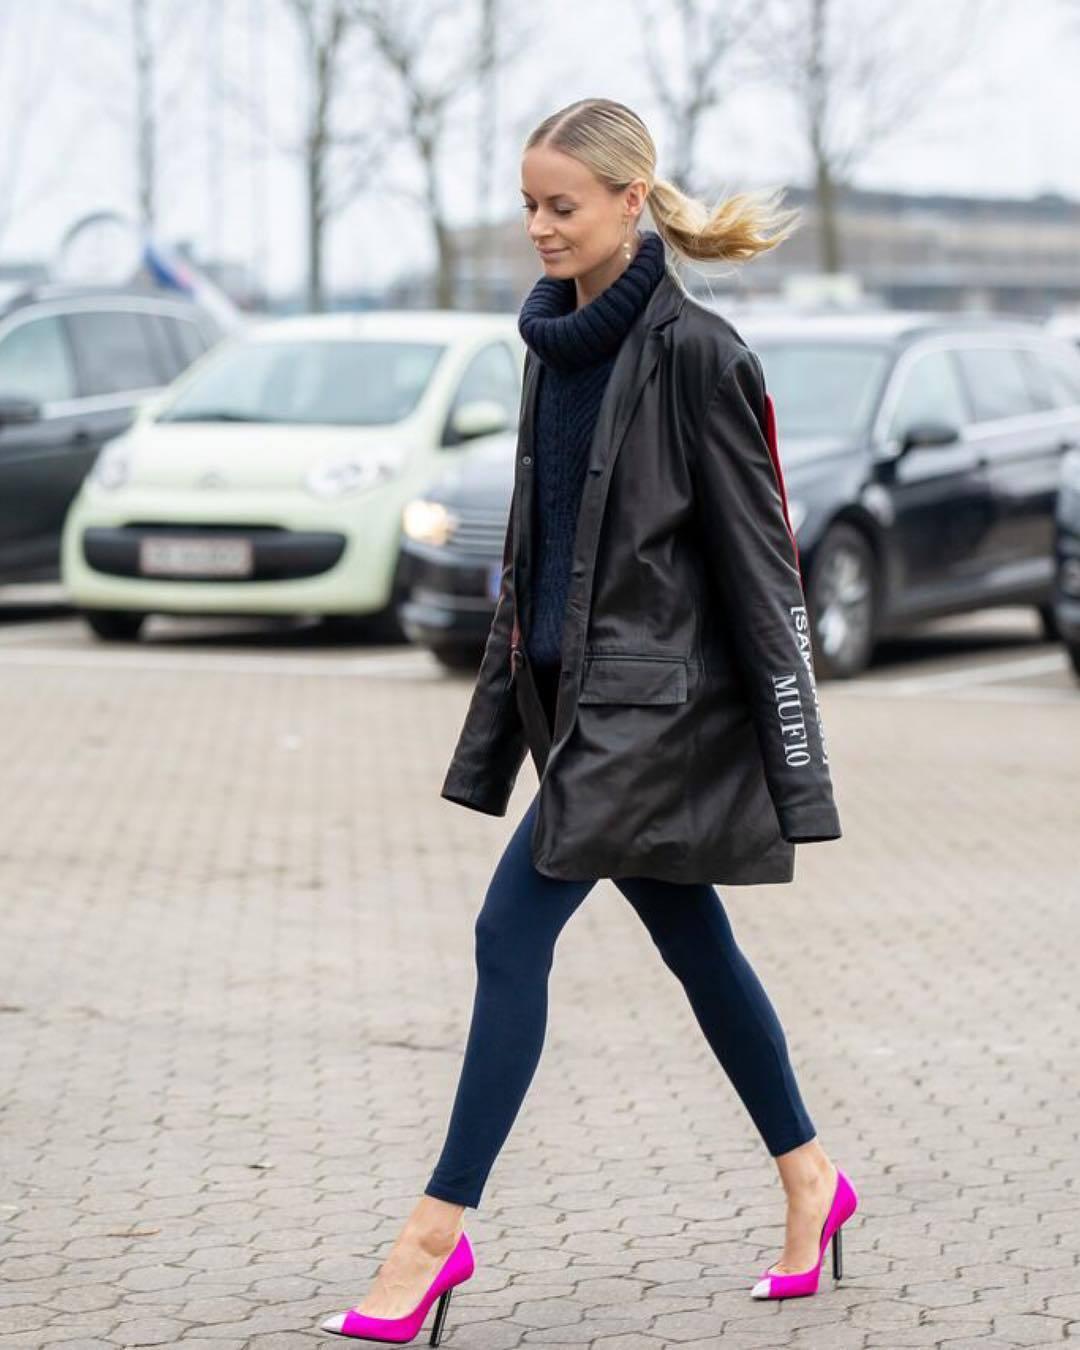 shoes pumps pink ysl leggings leather jacket oversized jacket turtleneck sweater cable knit navy